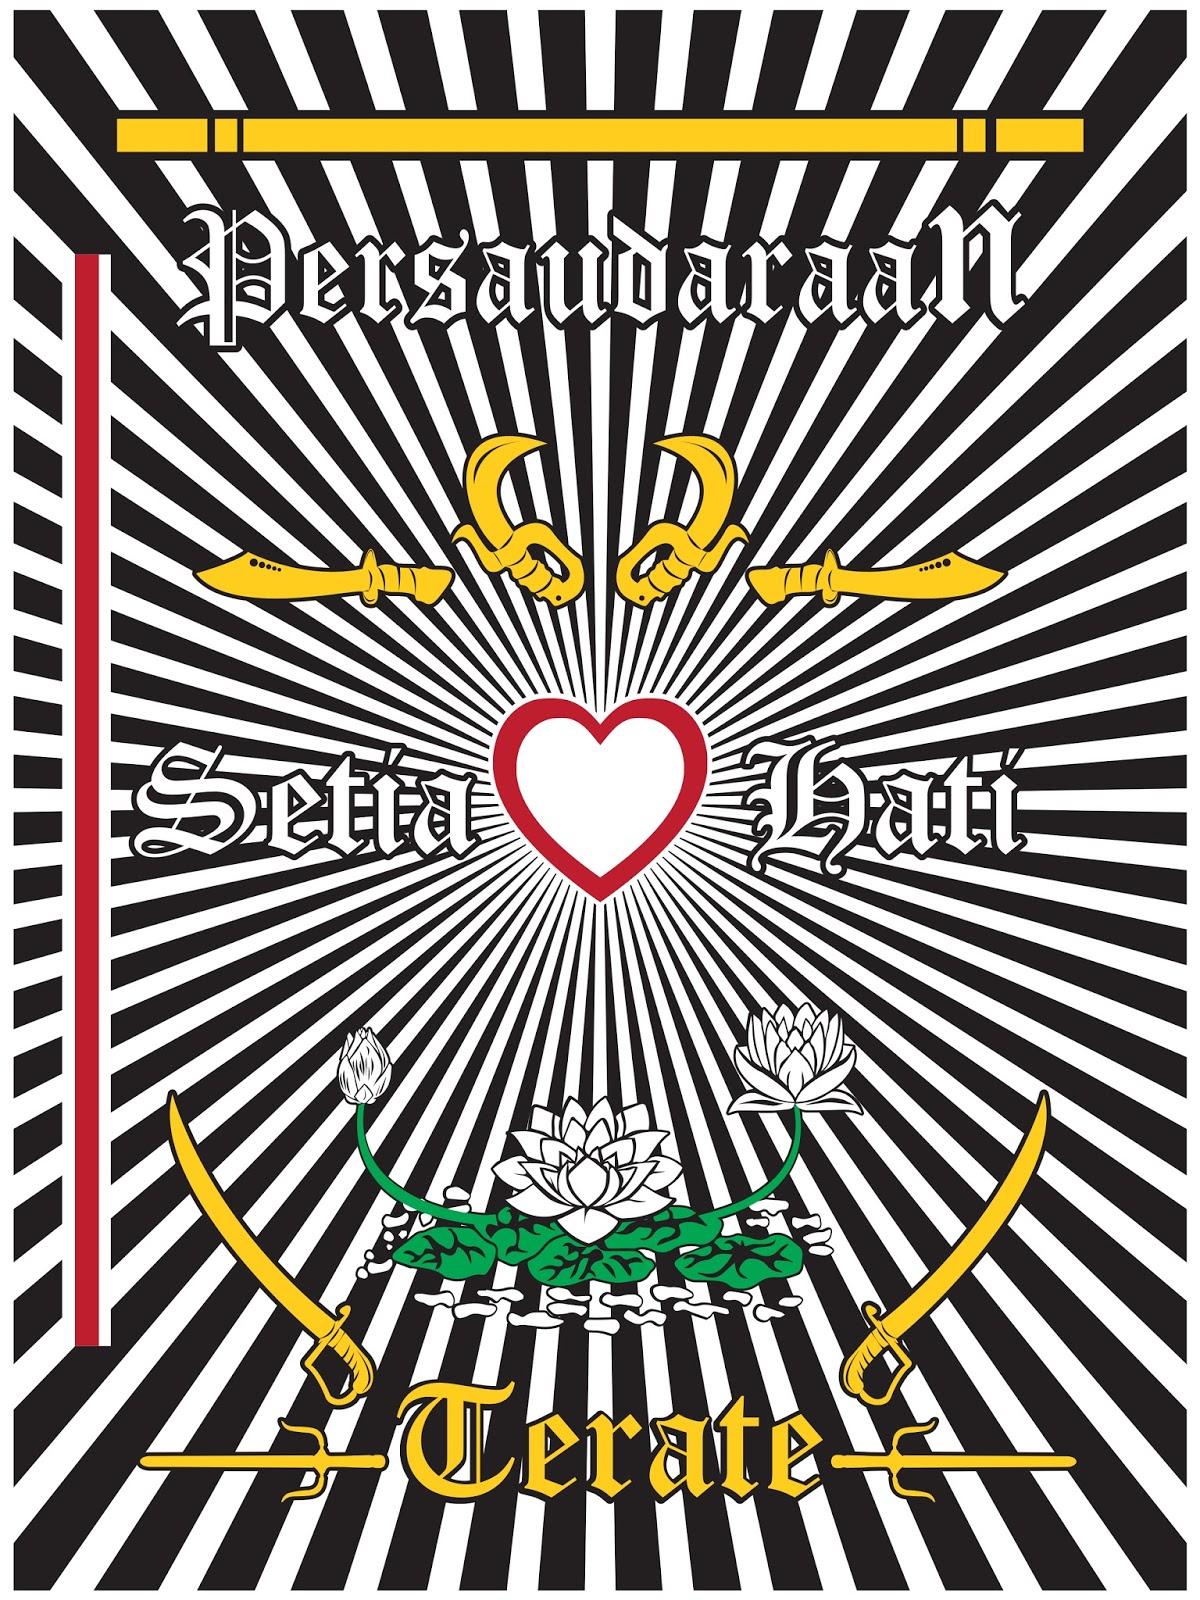 Psht Rayon Cibesel Logo Terbaru Gambar